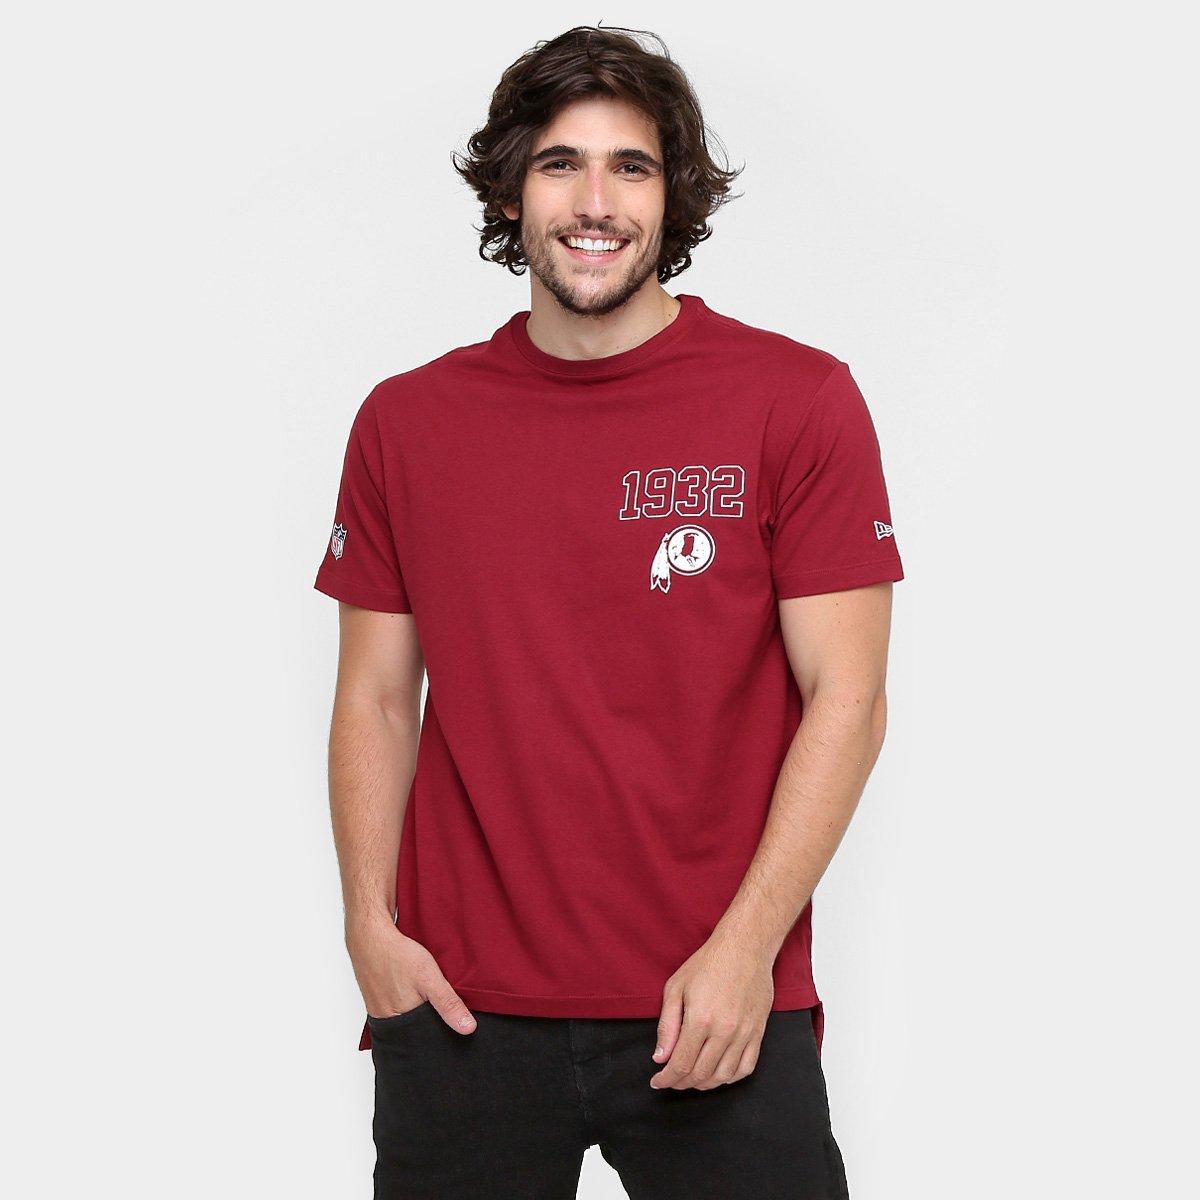 116ed6bf1 Camiseta New Era NFL Longer Washington Redskins - Compre Agora ...